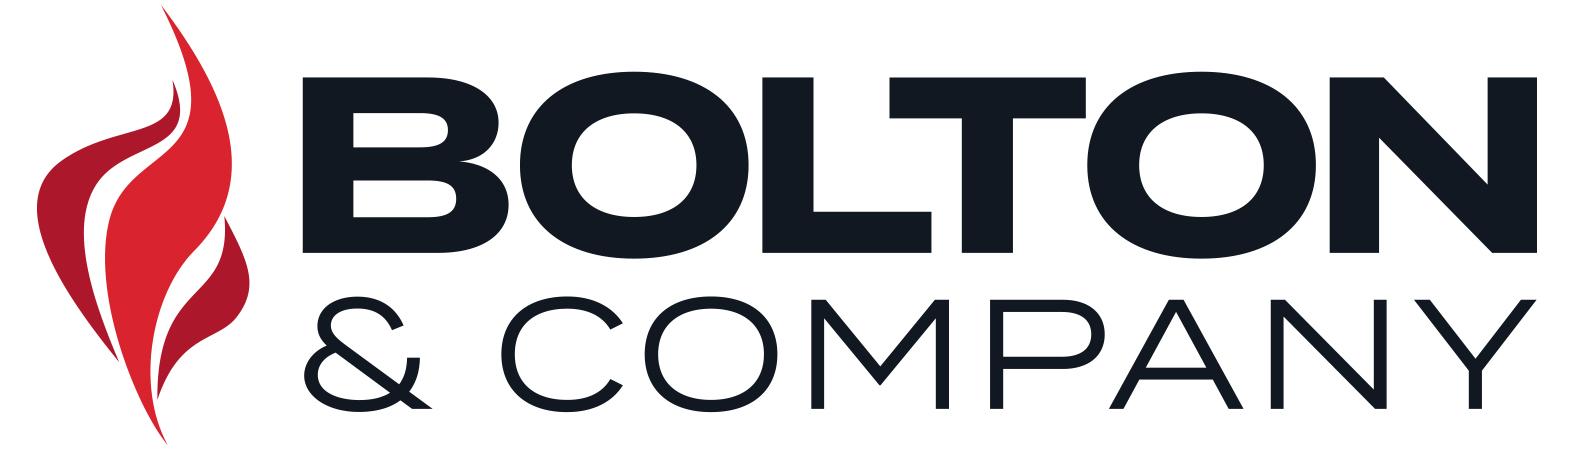 Bolton & Company Logo - Full Color